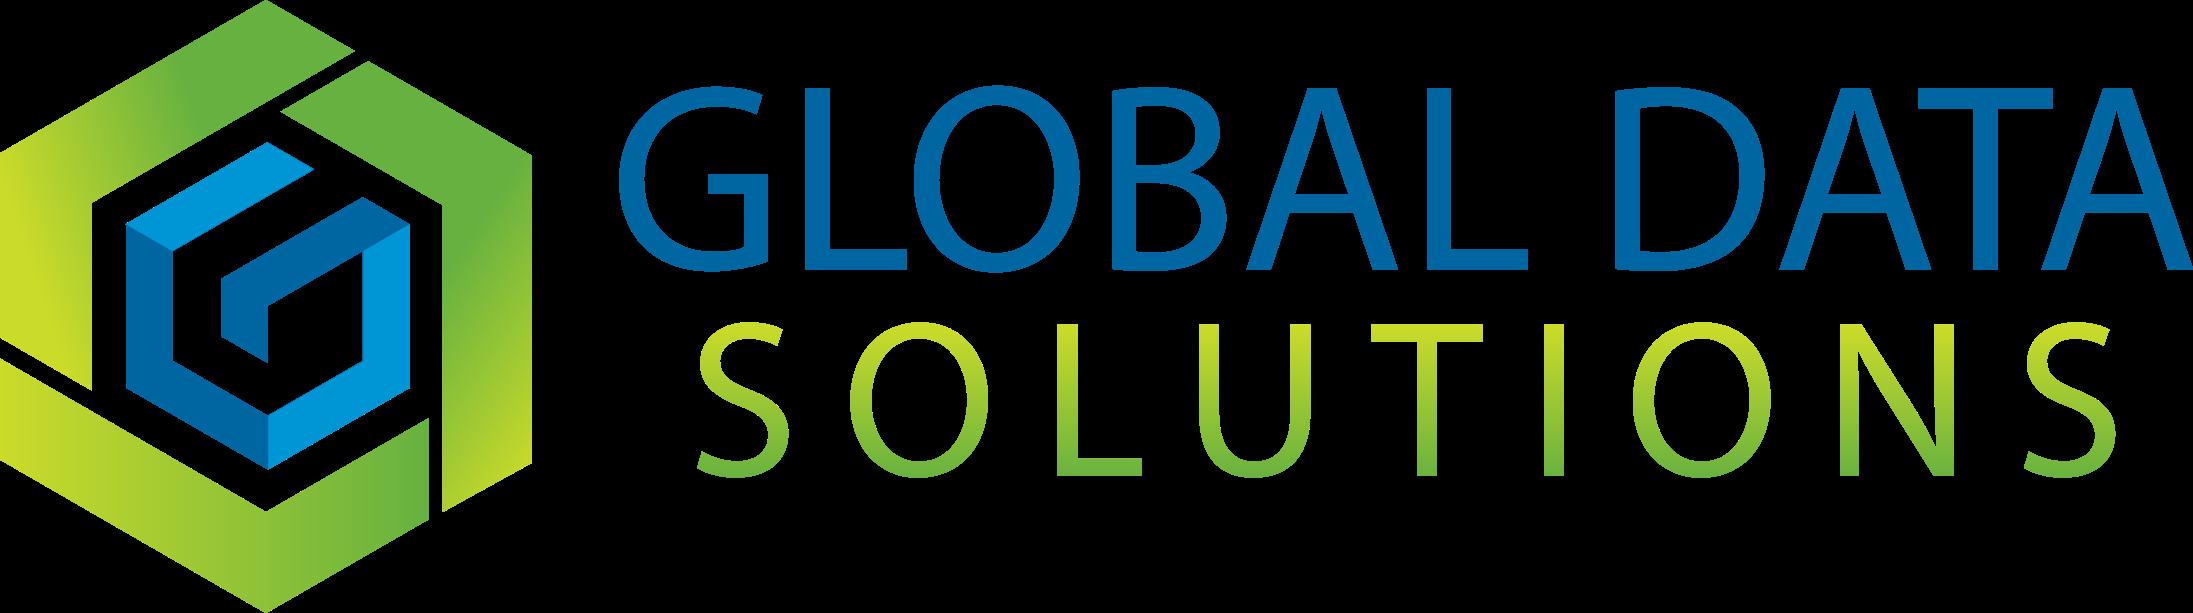 Global Data Solutions Logo